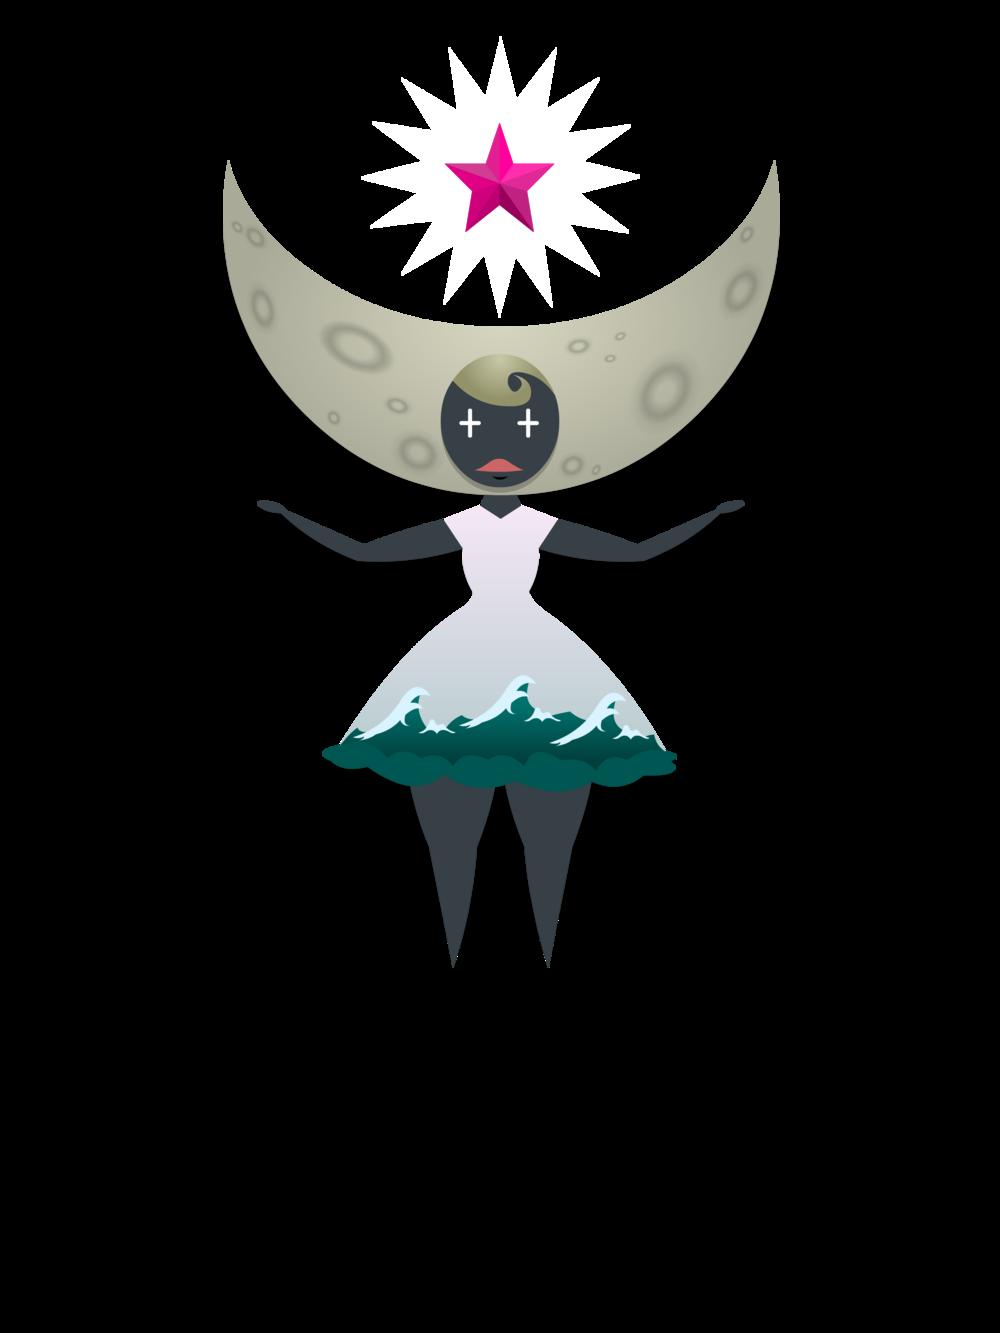 Astrid Moon Princess tee 2.png